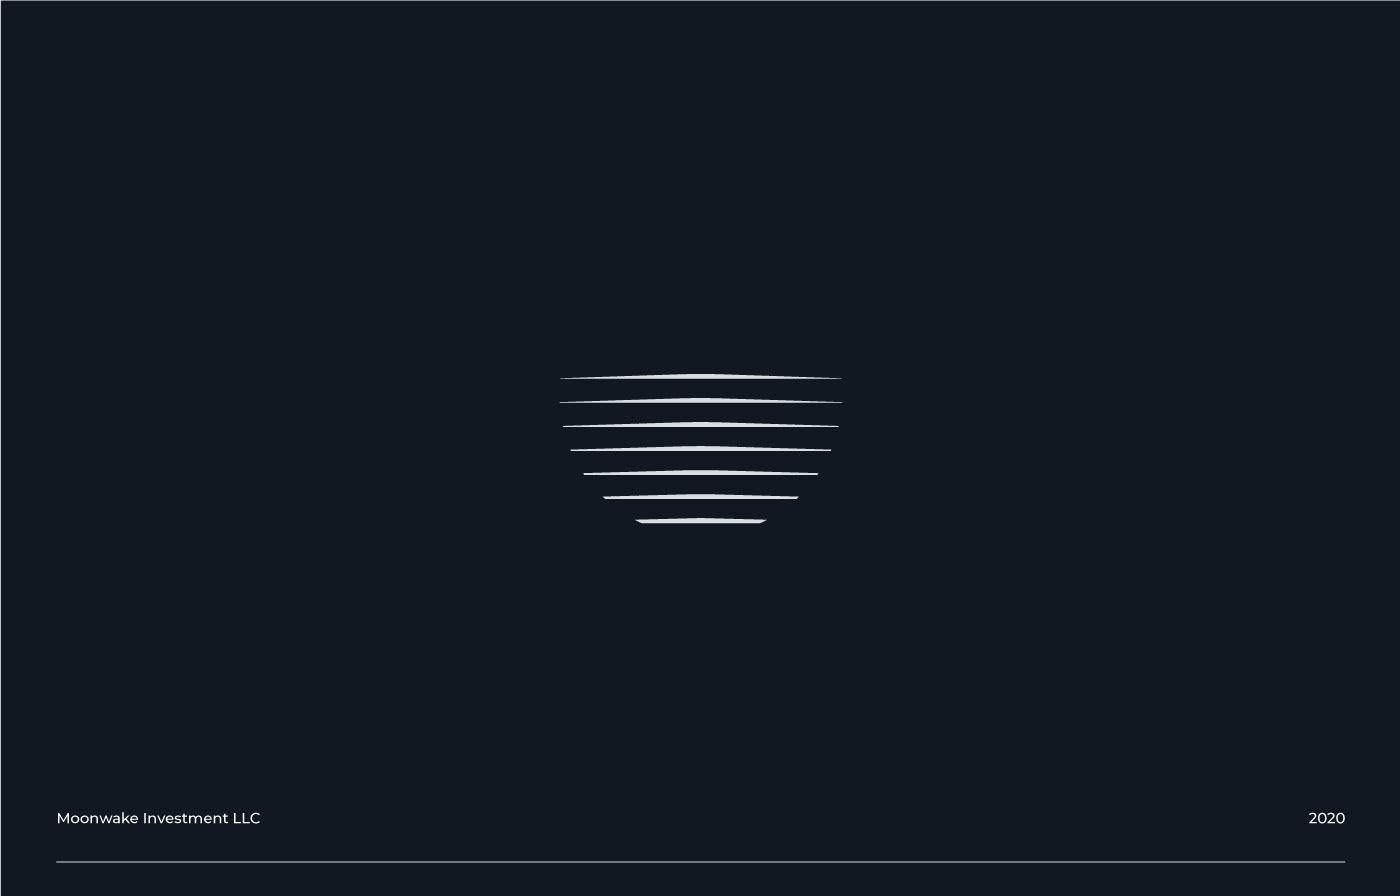 branding  design identity logo logofolio logotypes mark